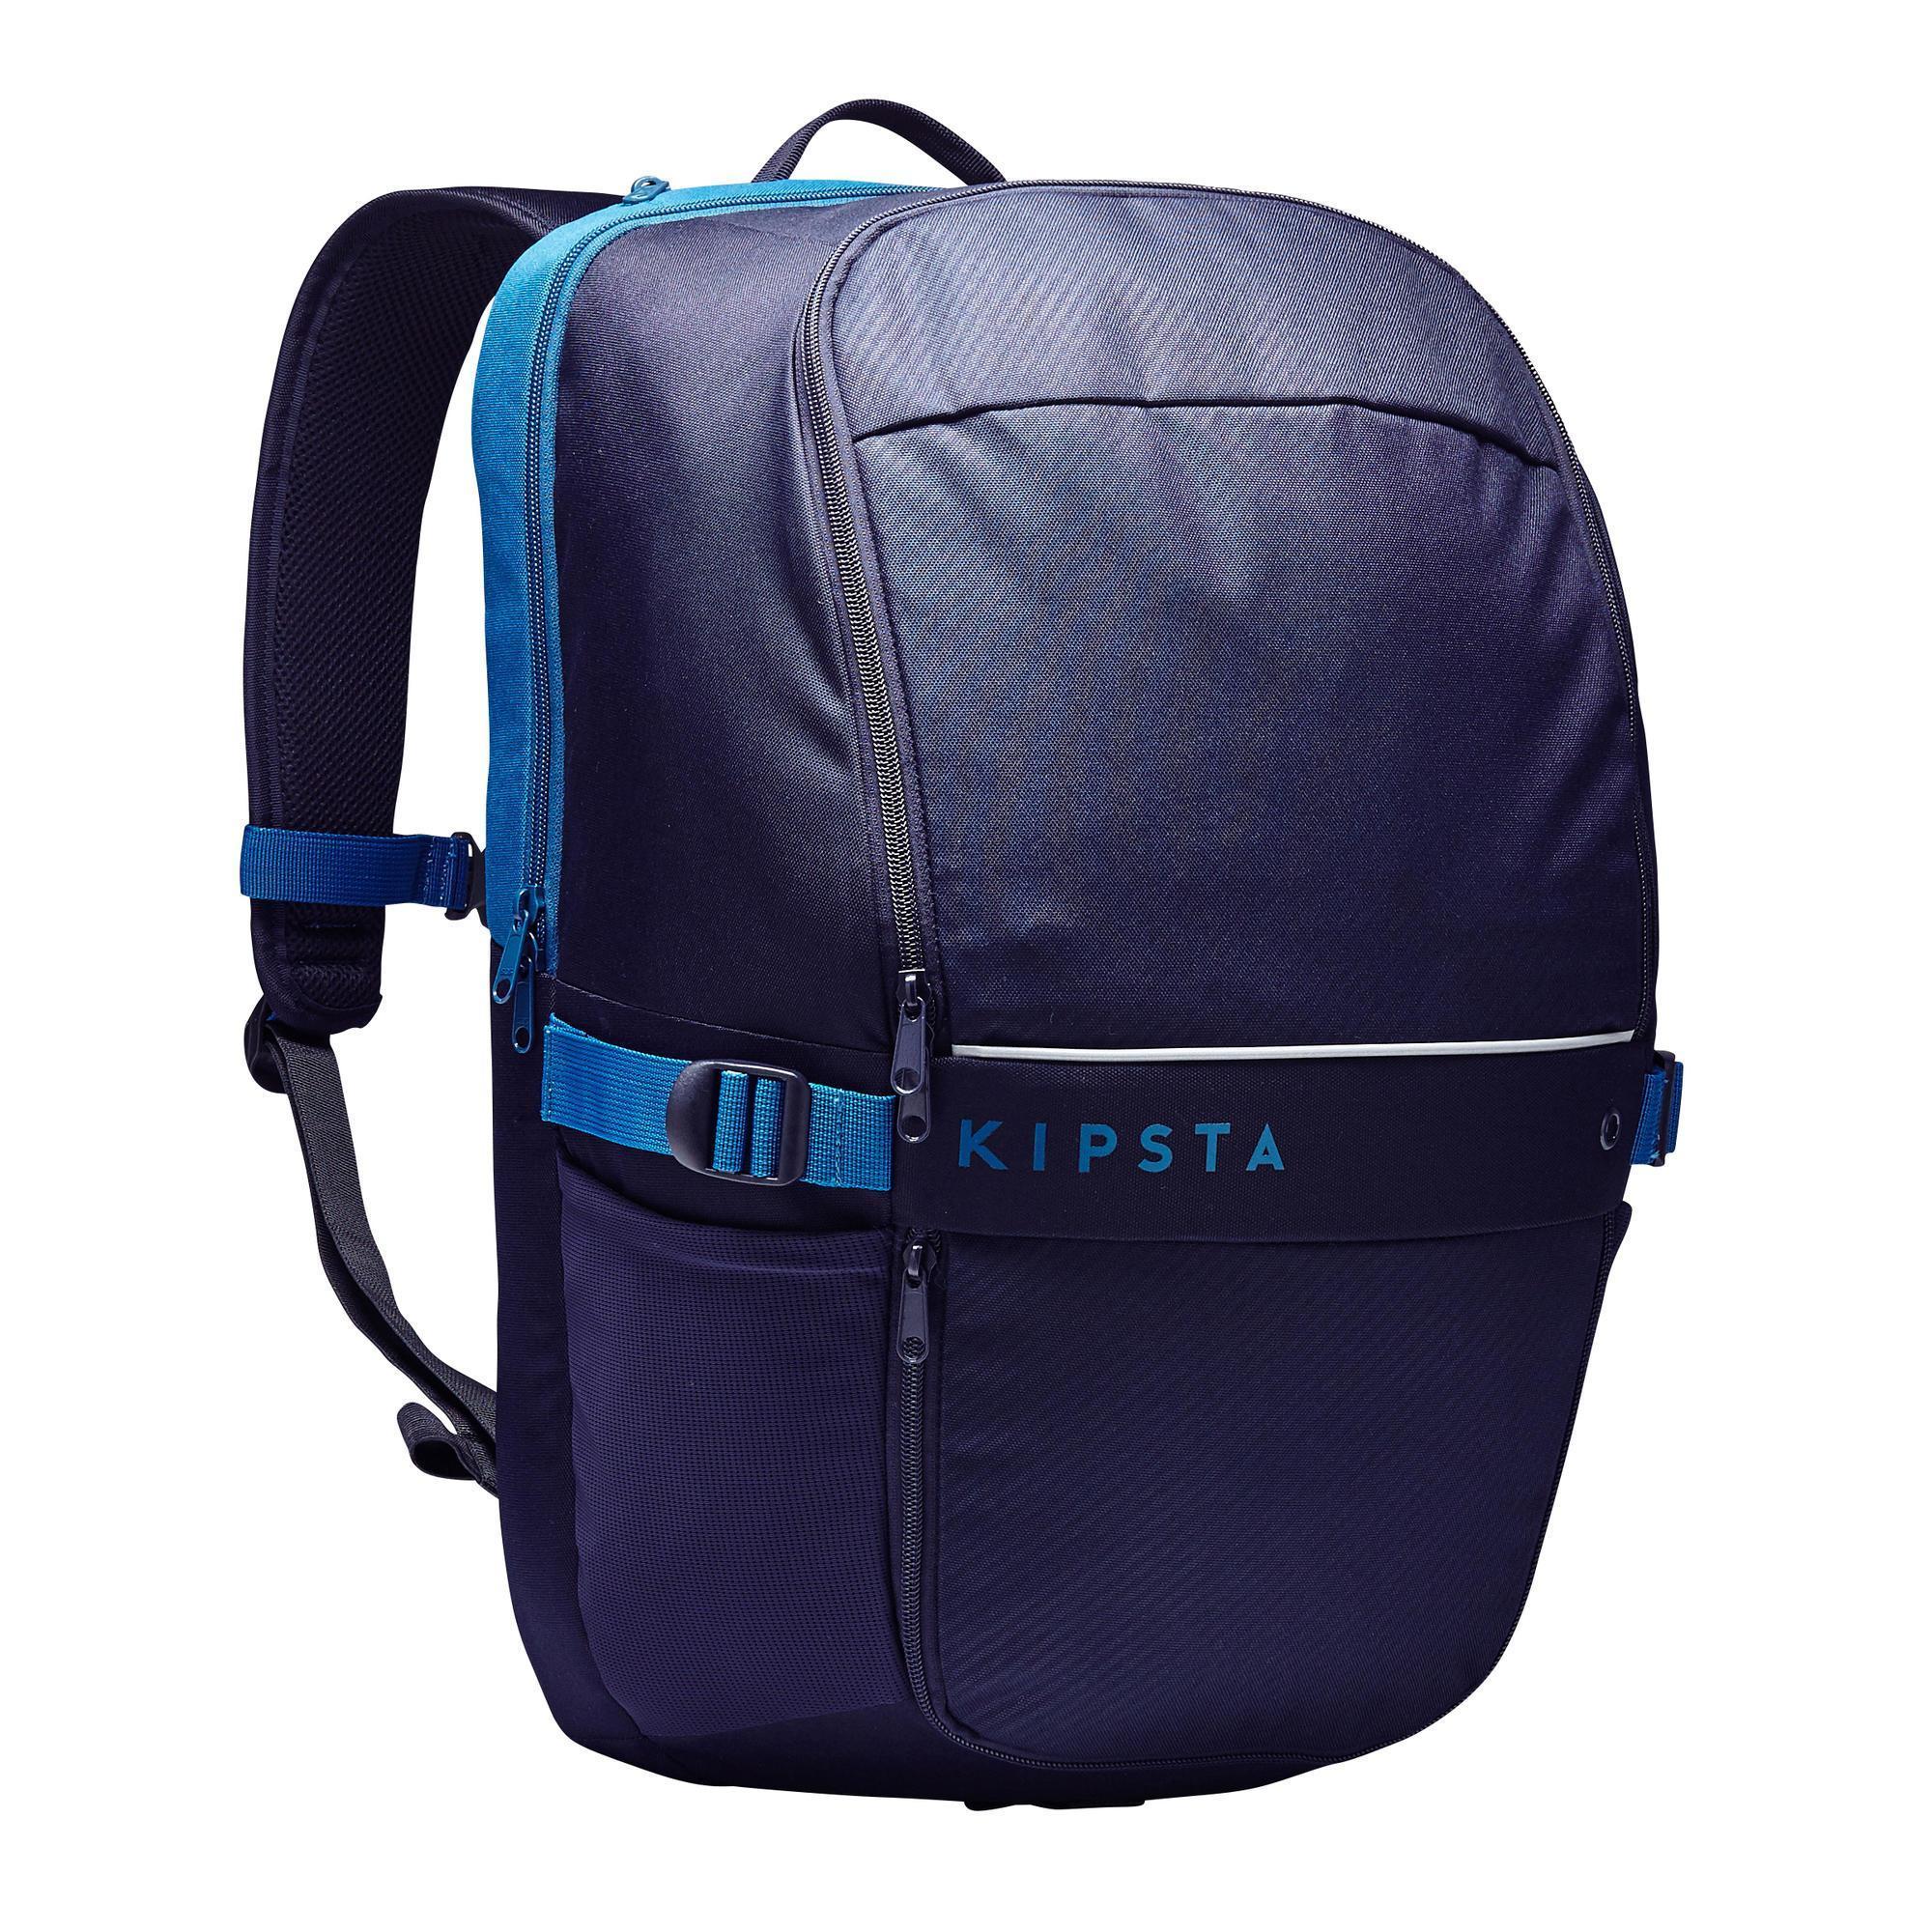 Sac à dos Kipsta Essentiel 35 litres - Bleu ou Rouge